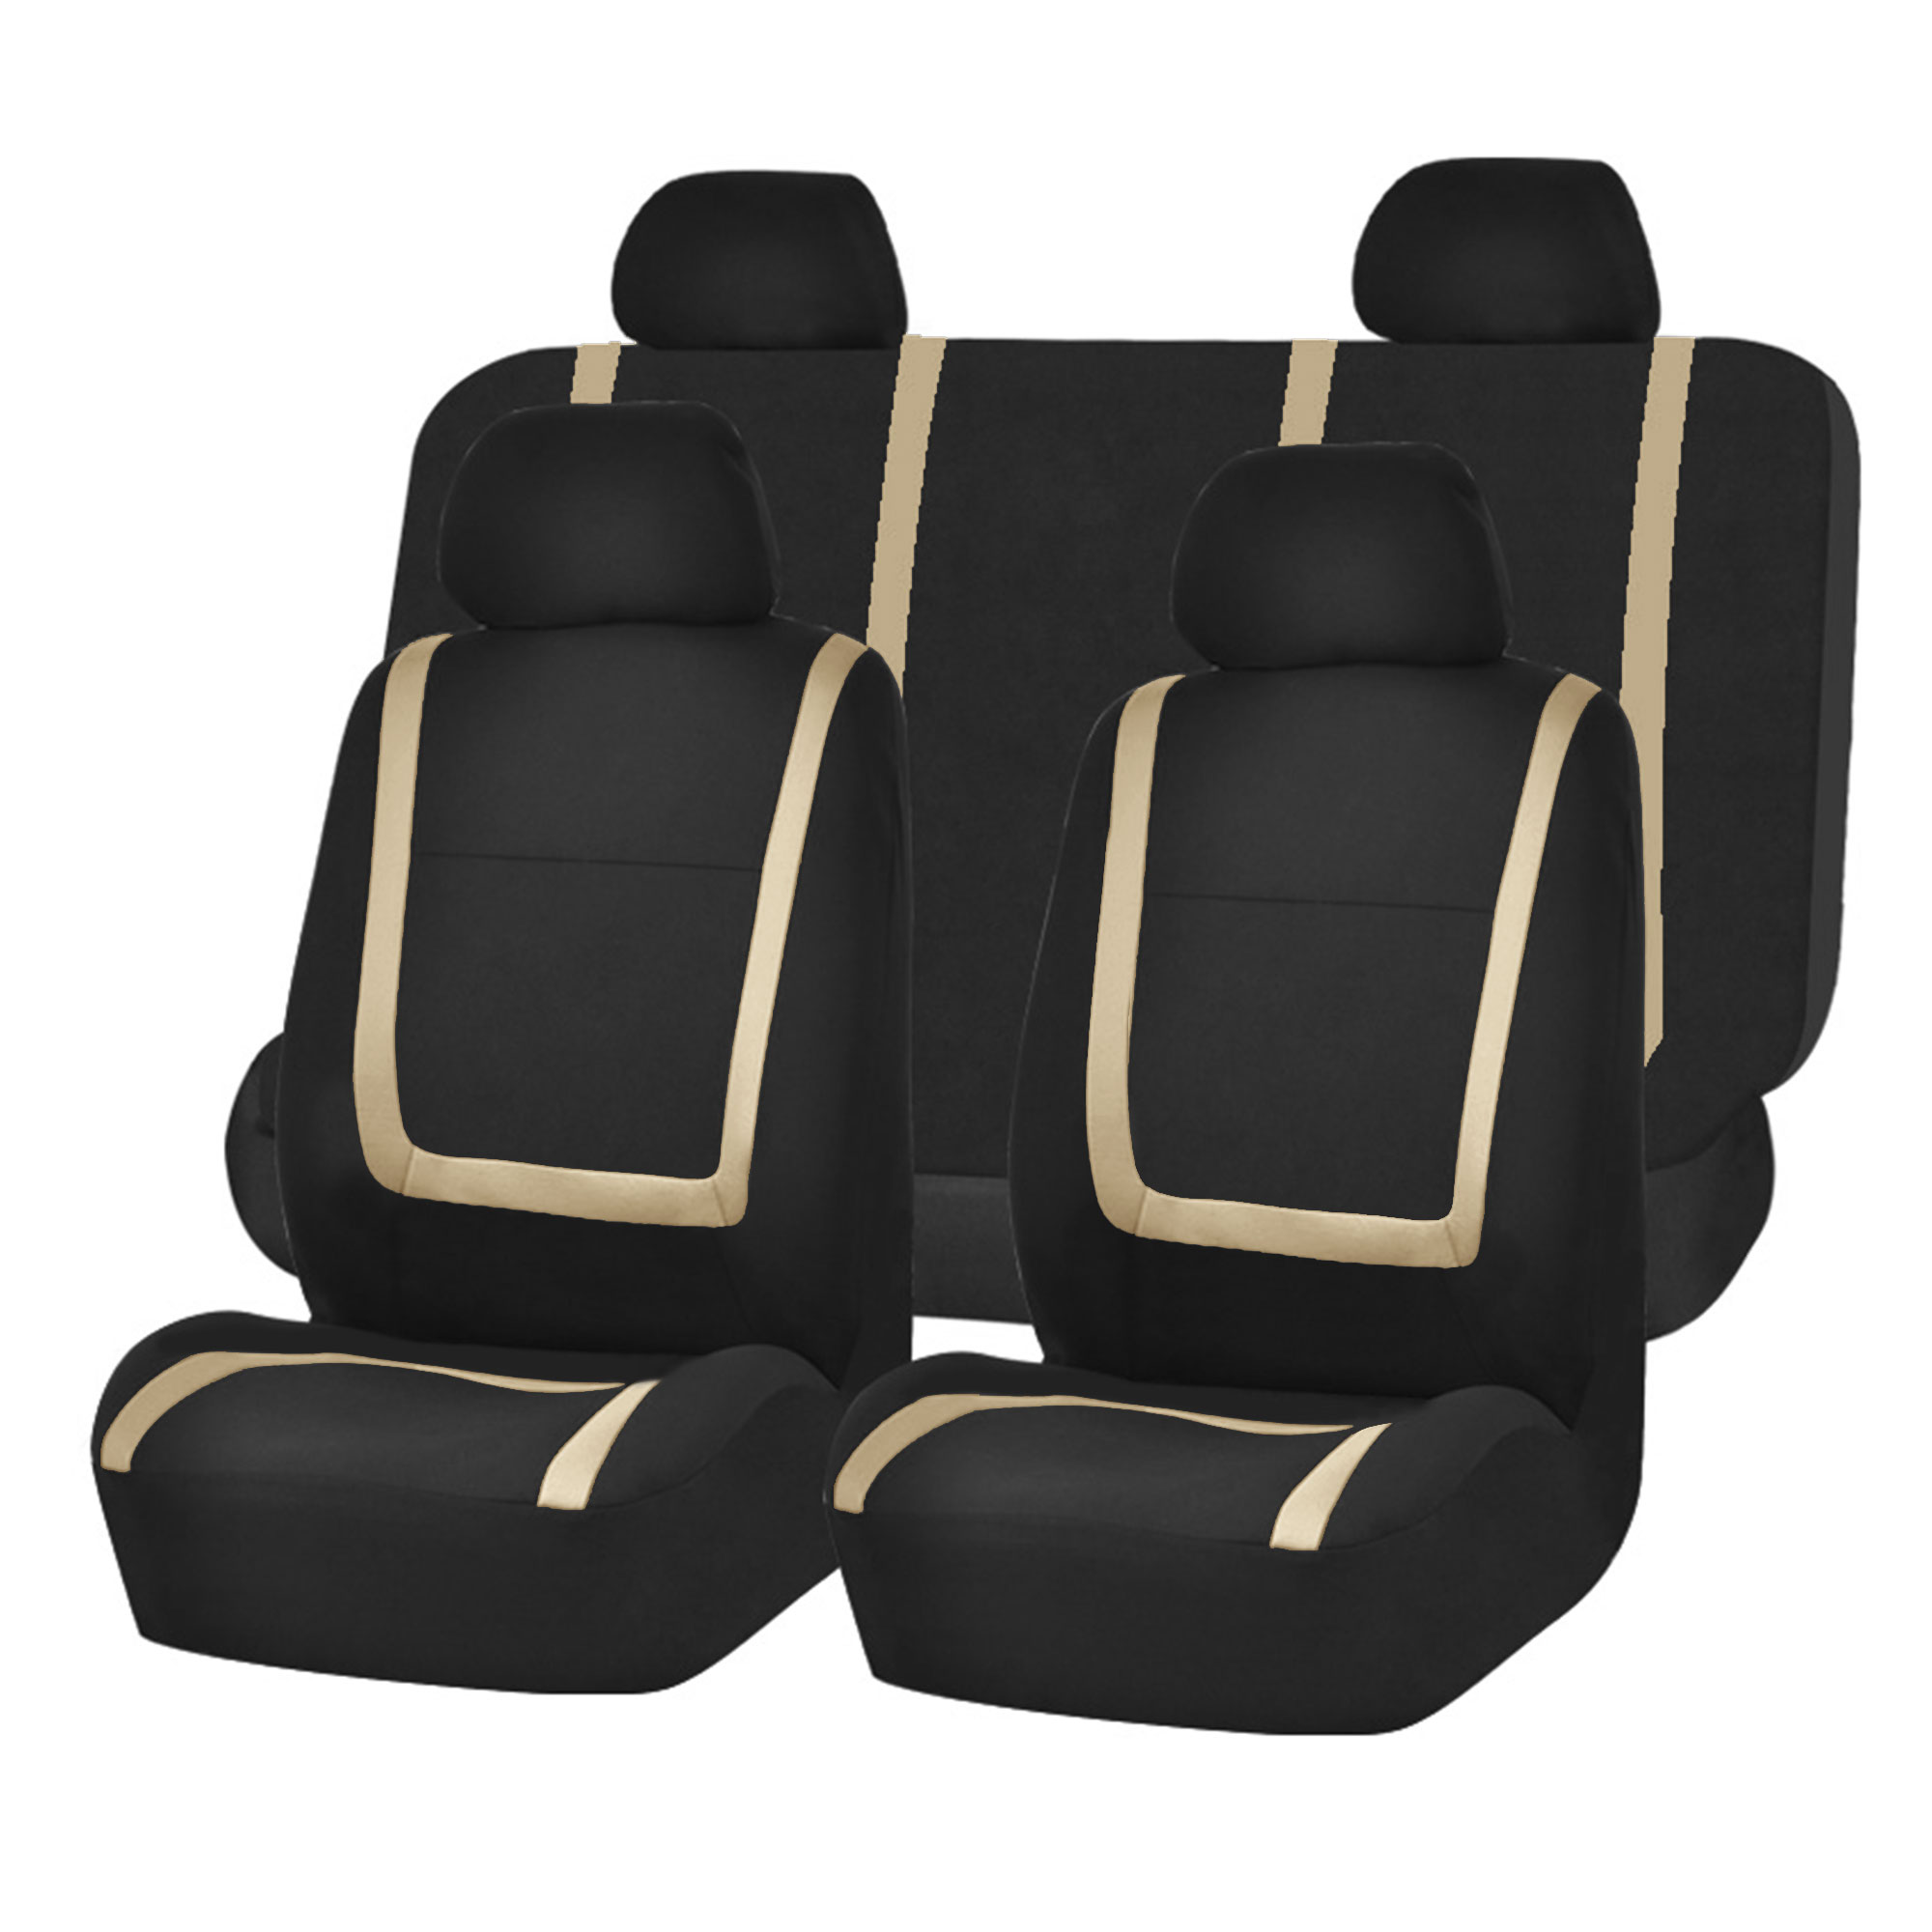 Auto Seat Covers for Car Sedan Truck Van Universal Seat Covers 12 Colors Beige